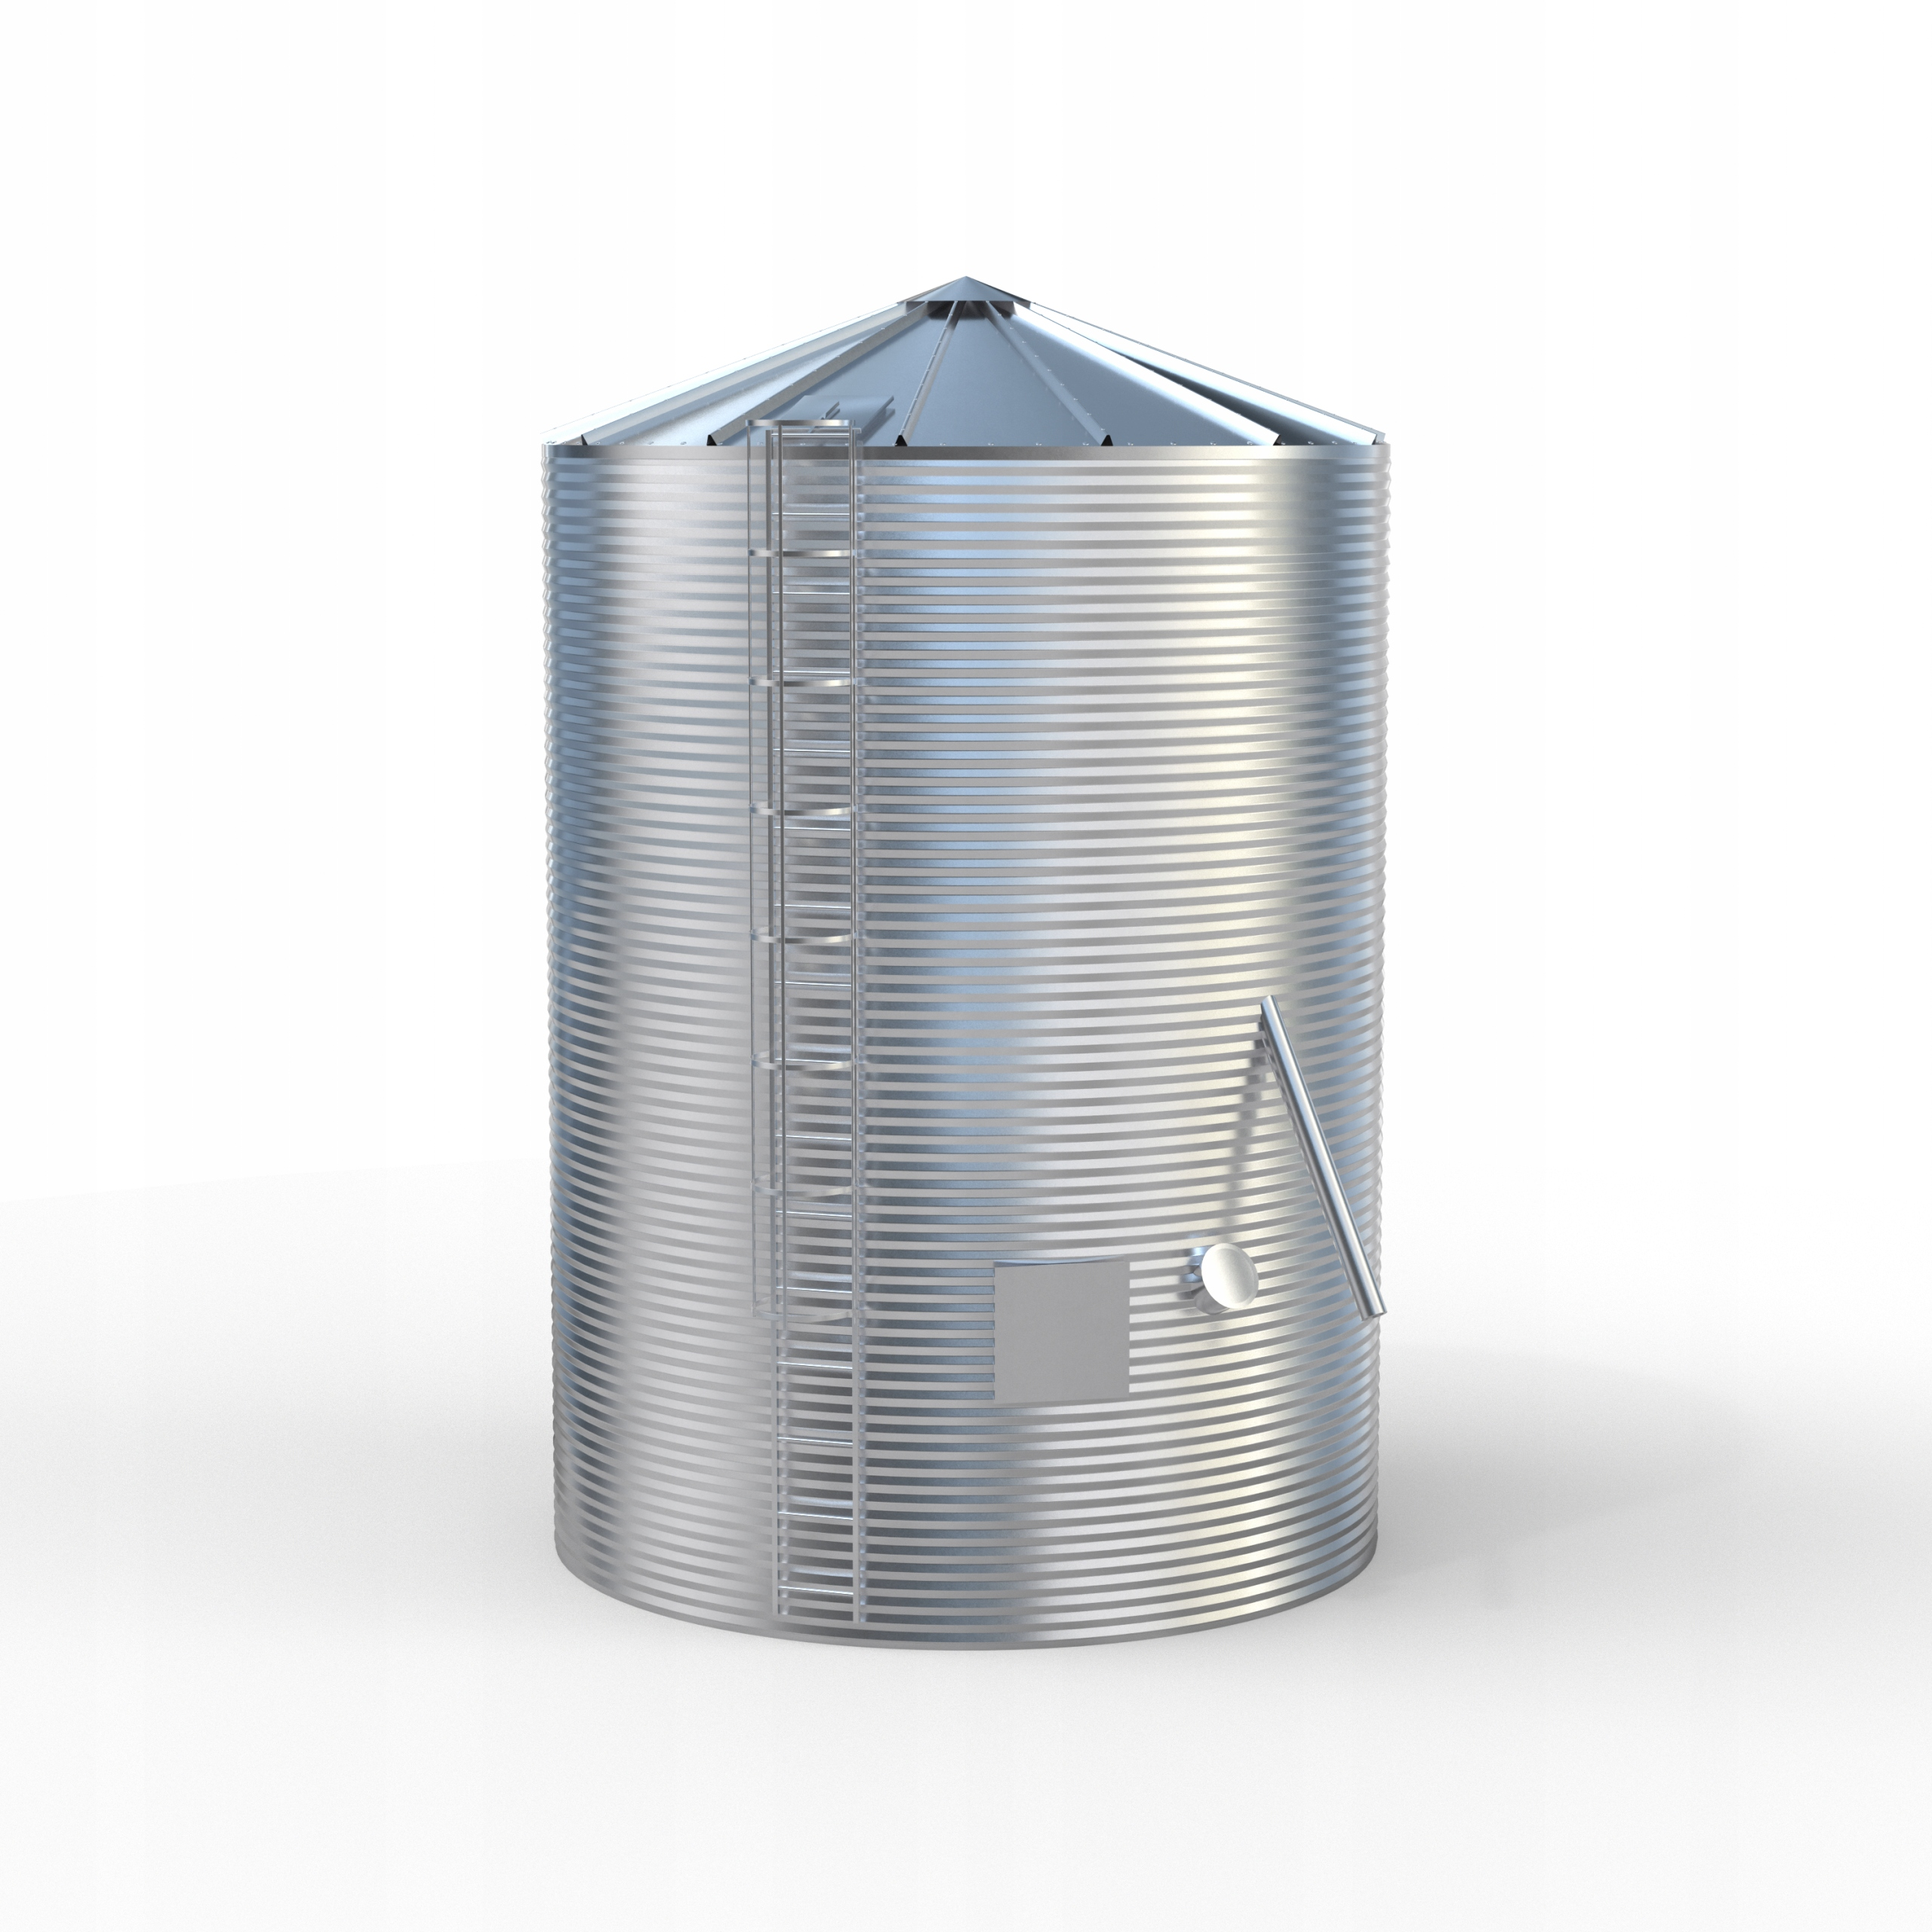 Silosy zbożowe AGOS 75 ton silos PRODUCENT 72h